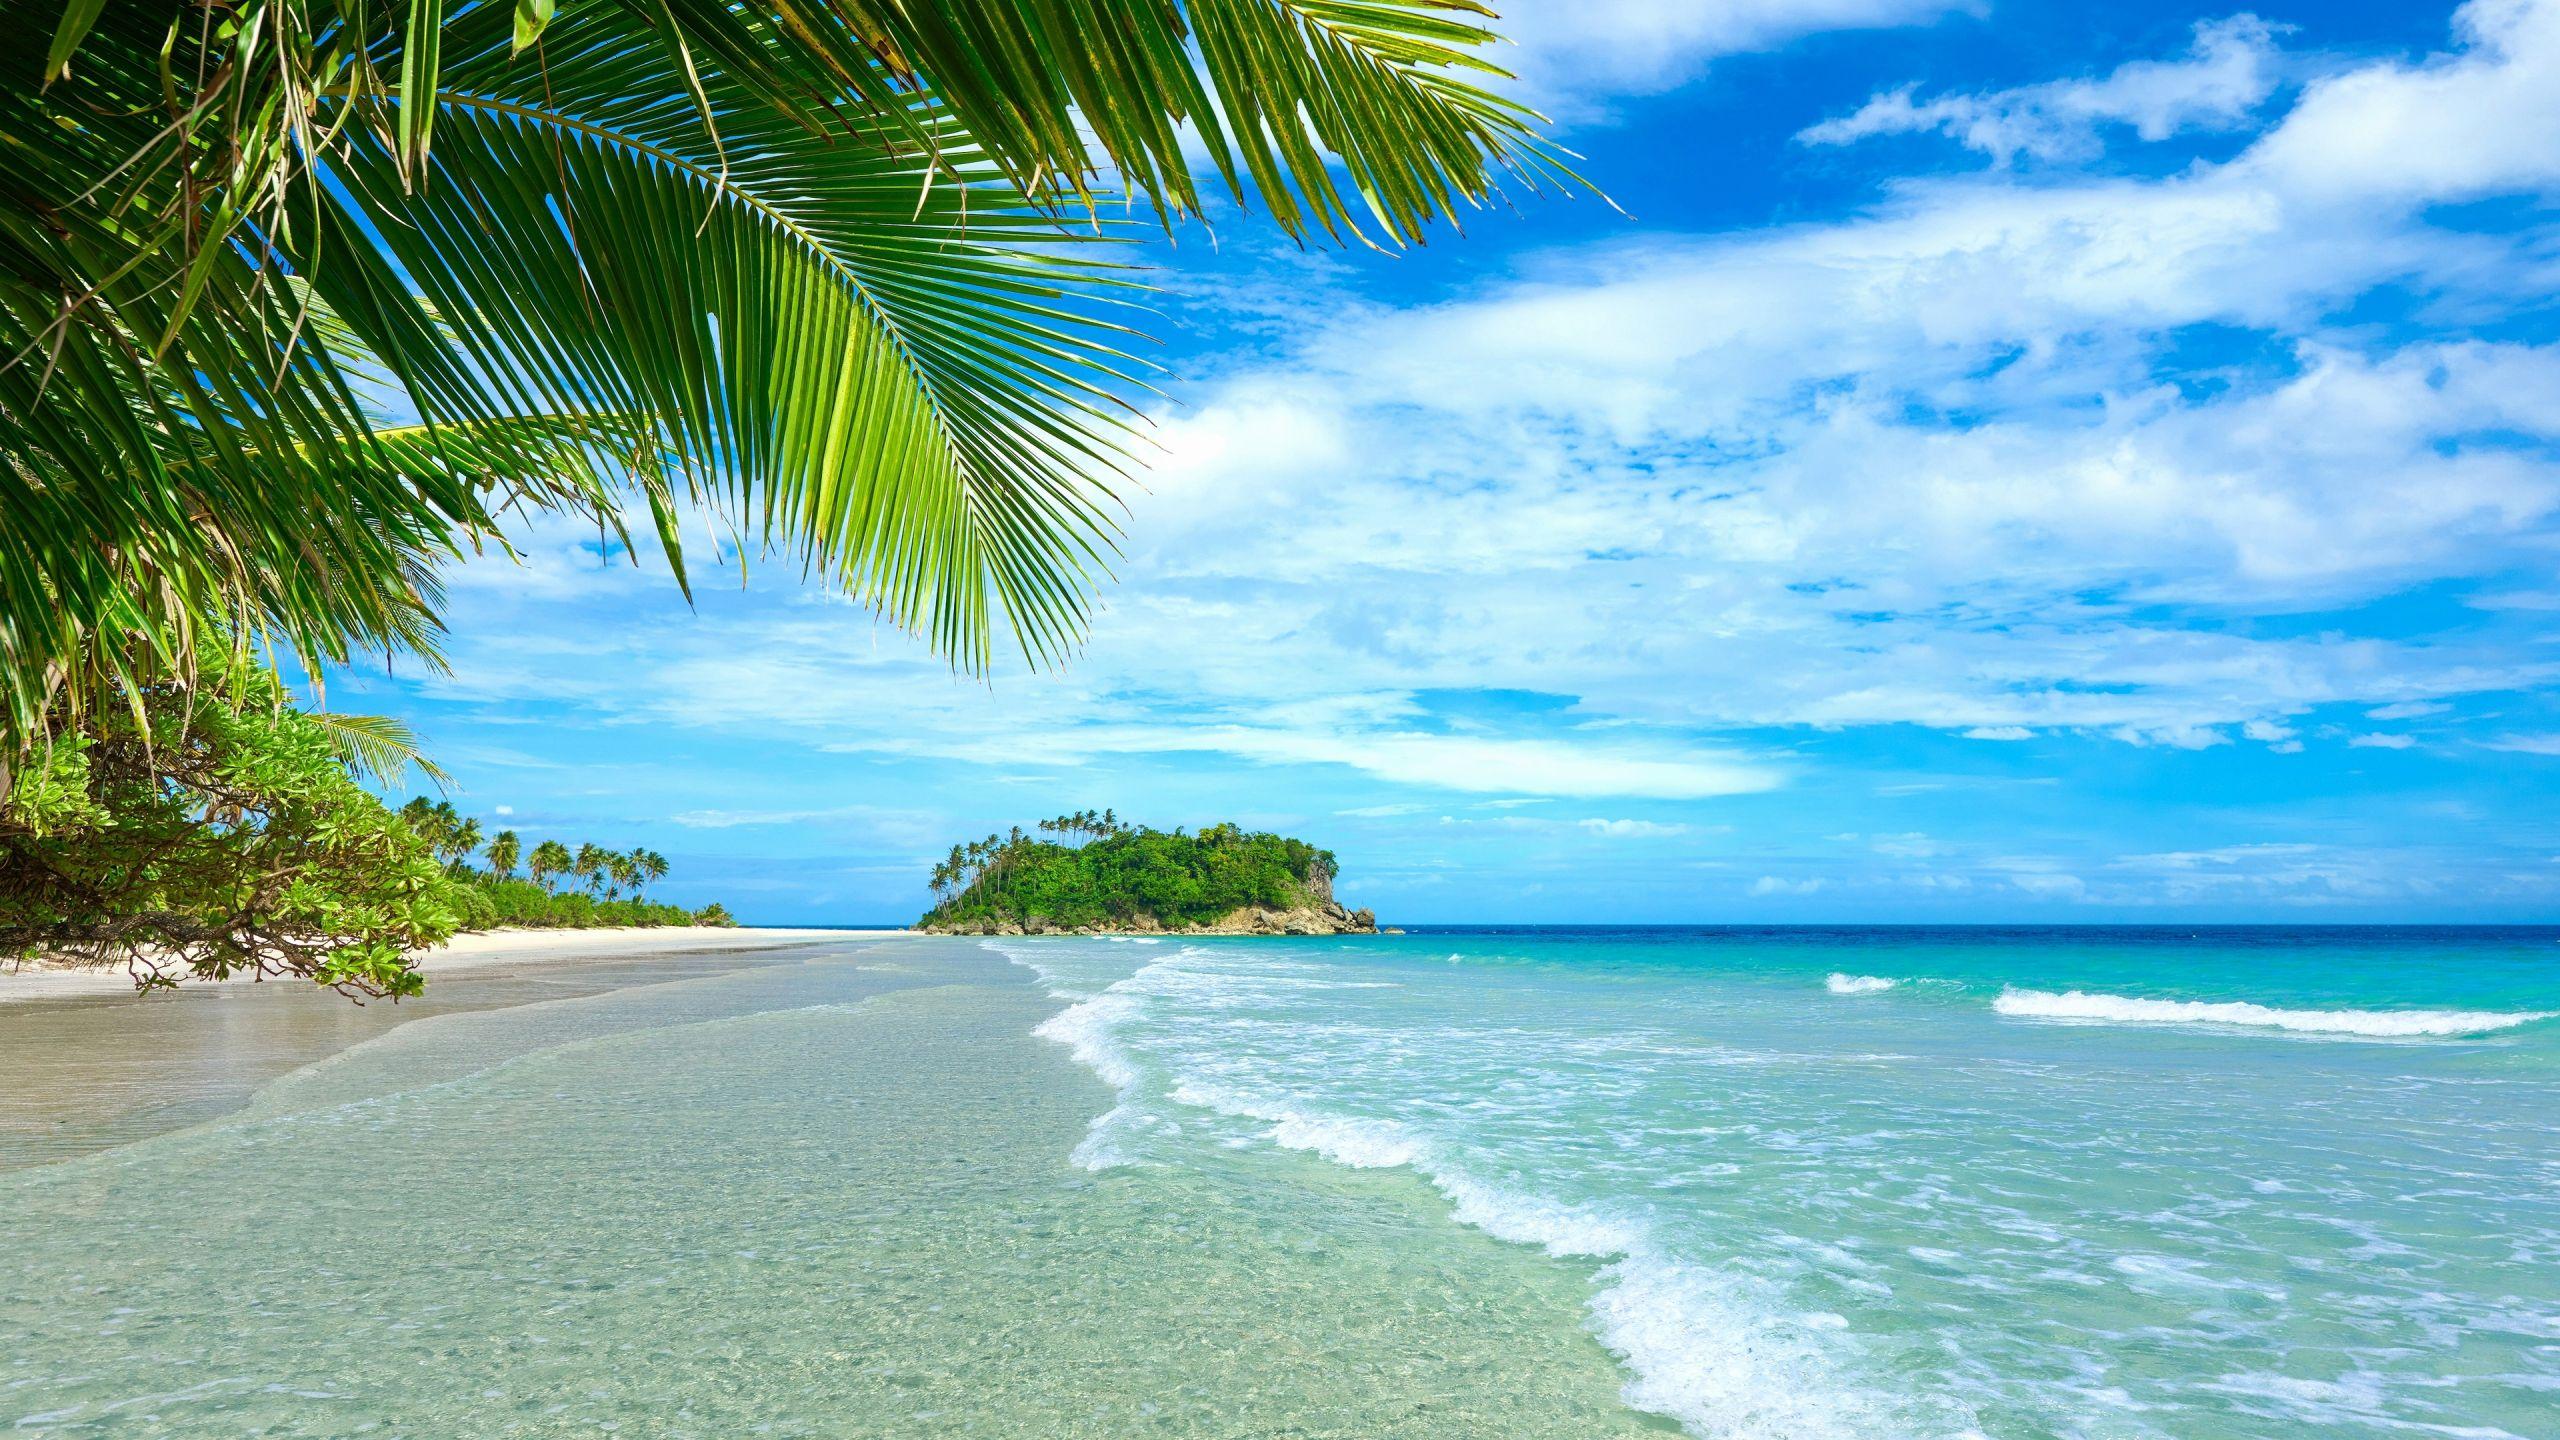 Beautiful Scenery Beach 2560x1440 Download Hd Wallpaper Wallpapertip